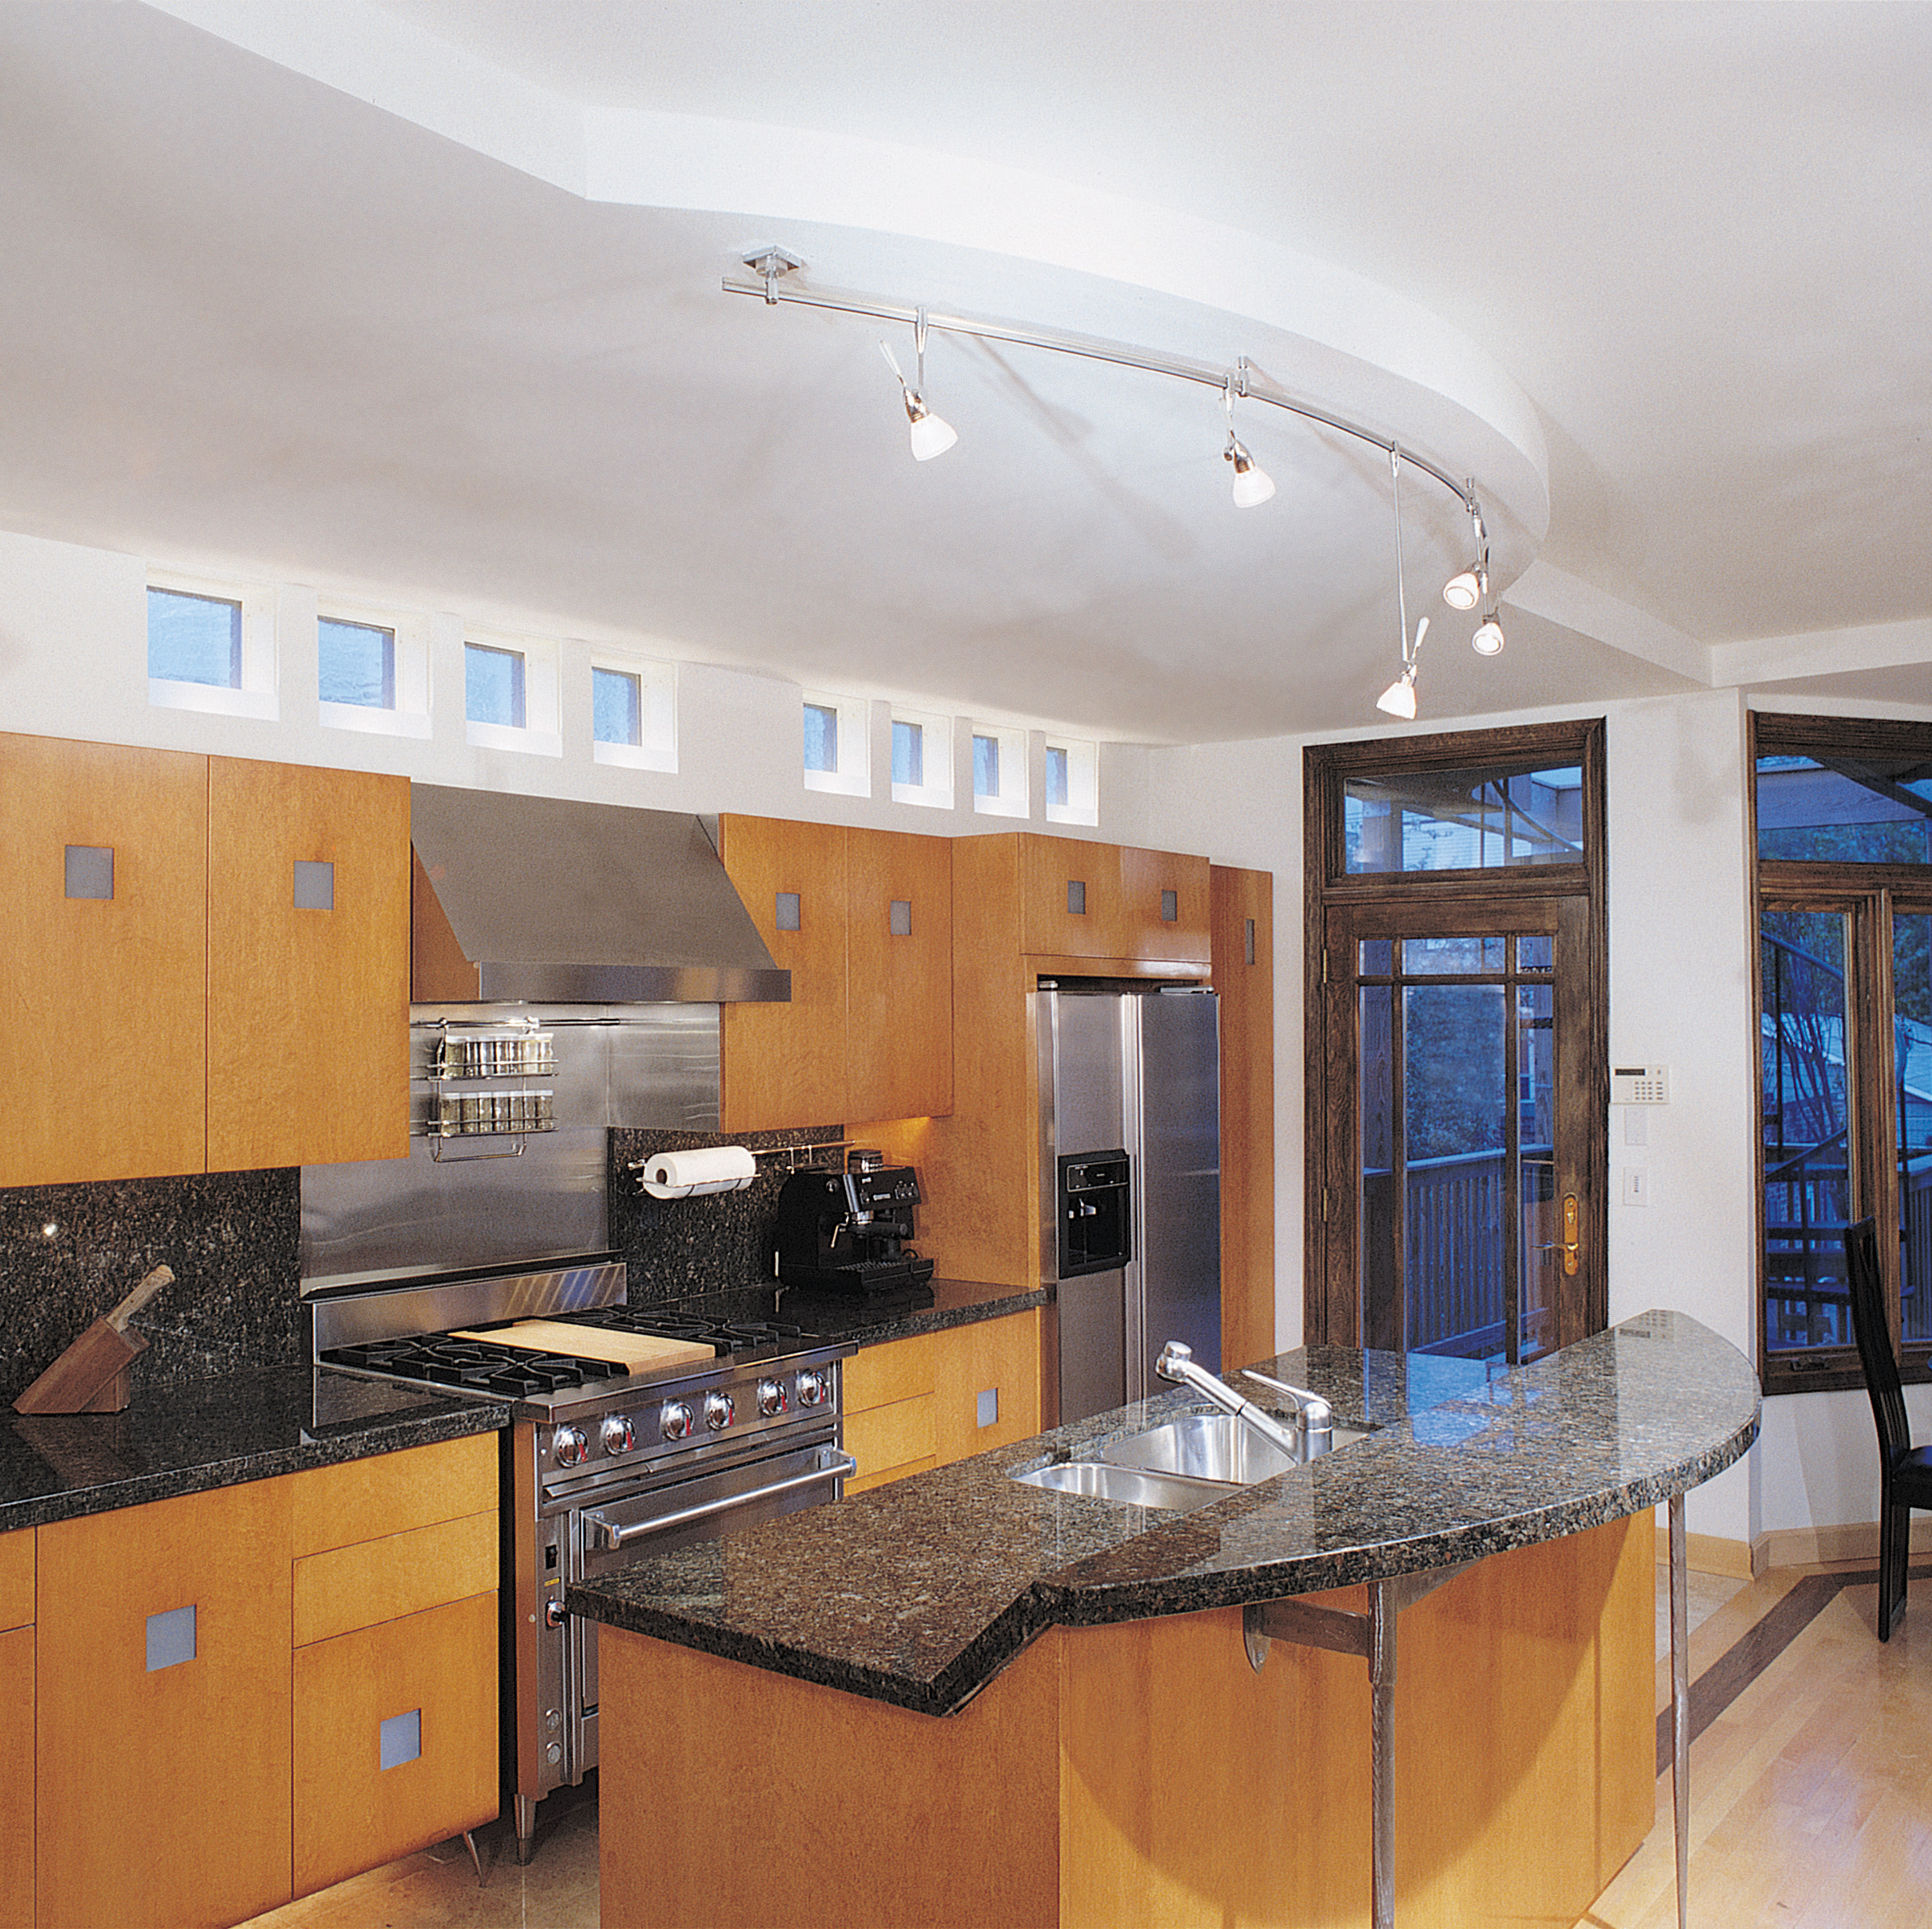 Releasedetails track lighting for kitchen ALA member manufacturer Tech Lighting showcases newest trends in track lighting